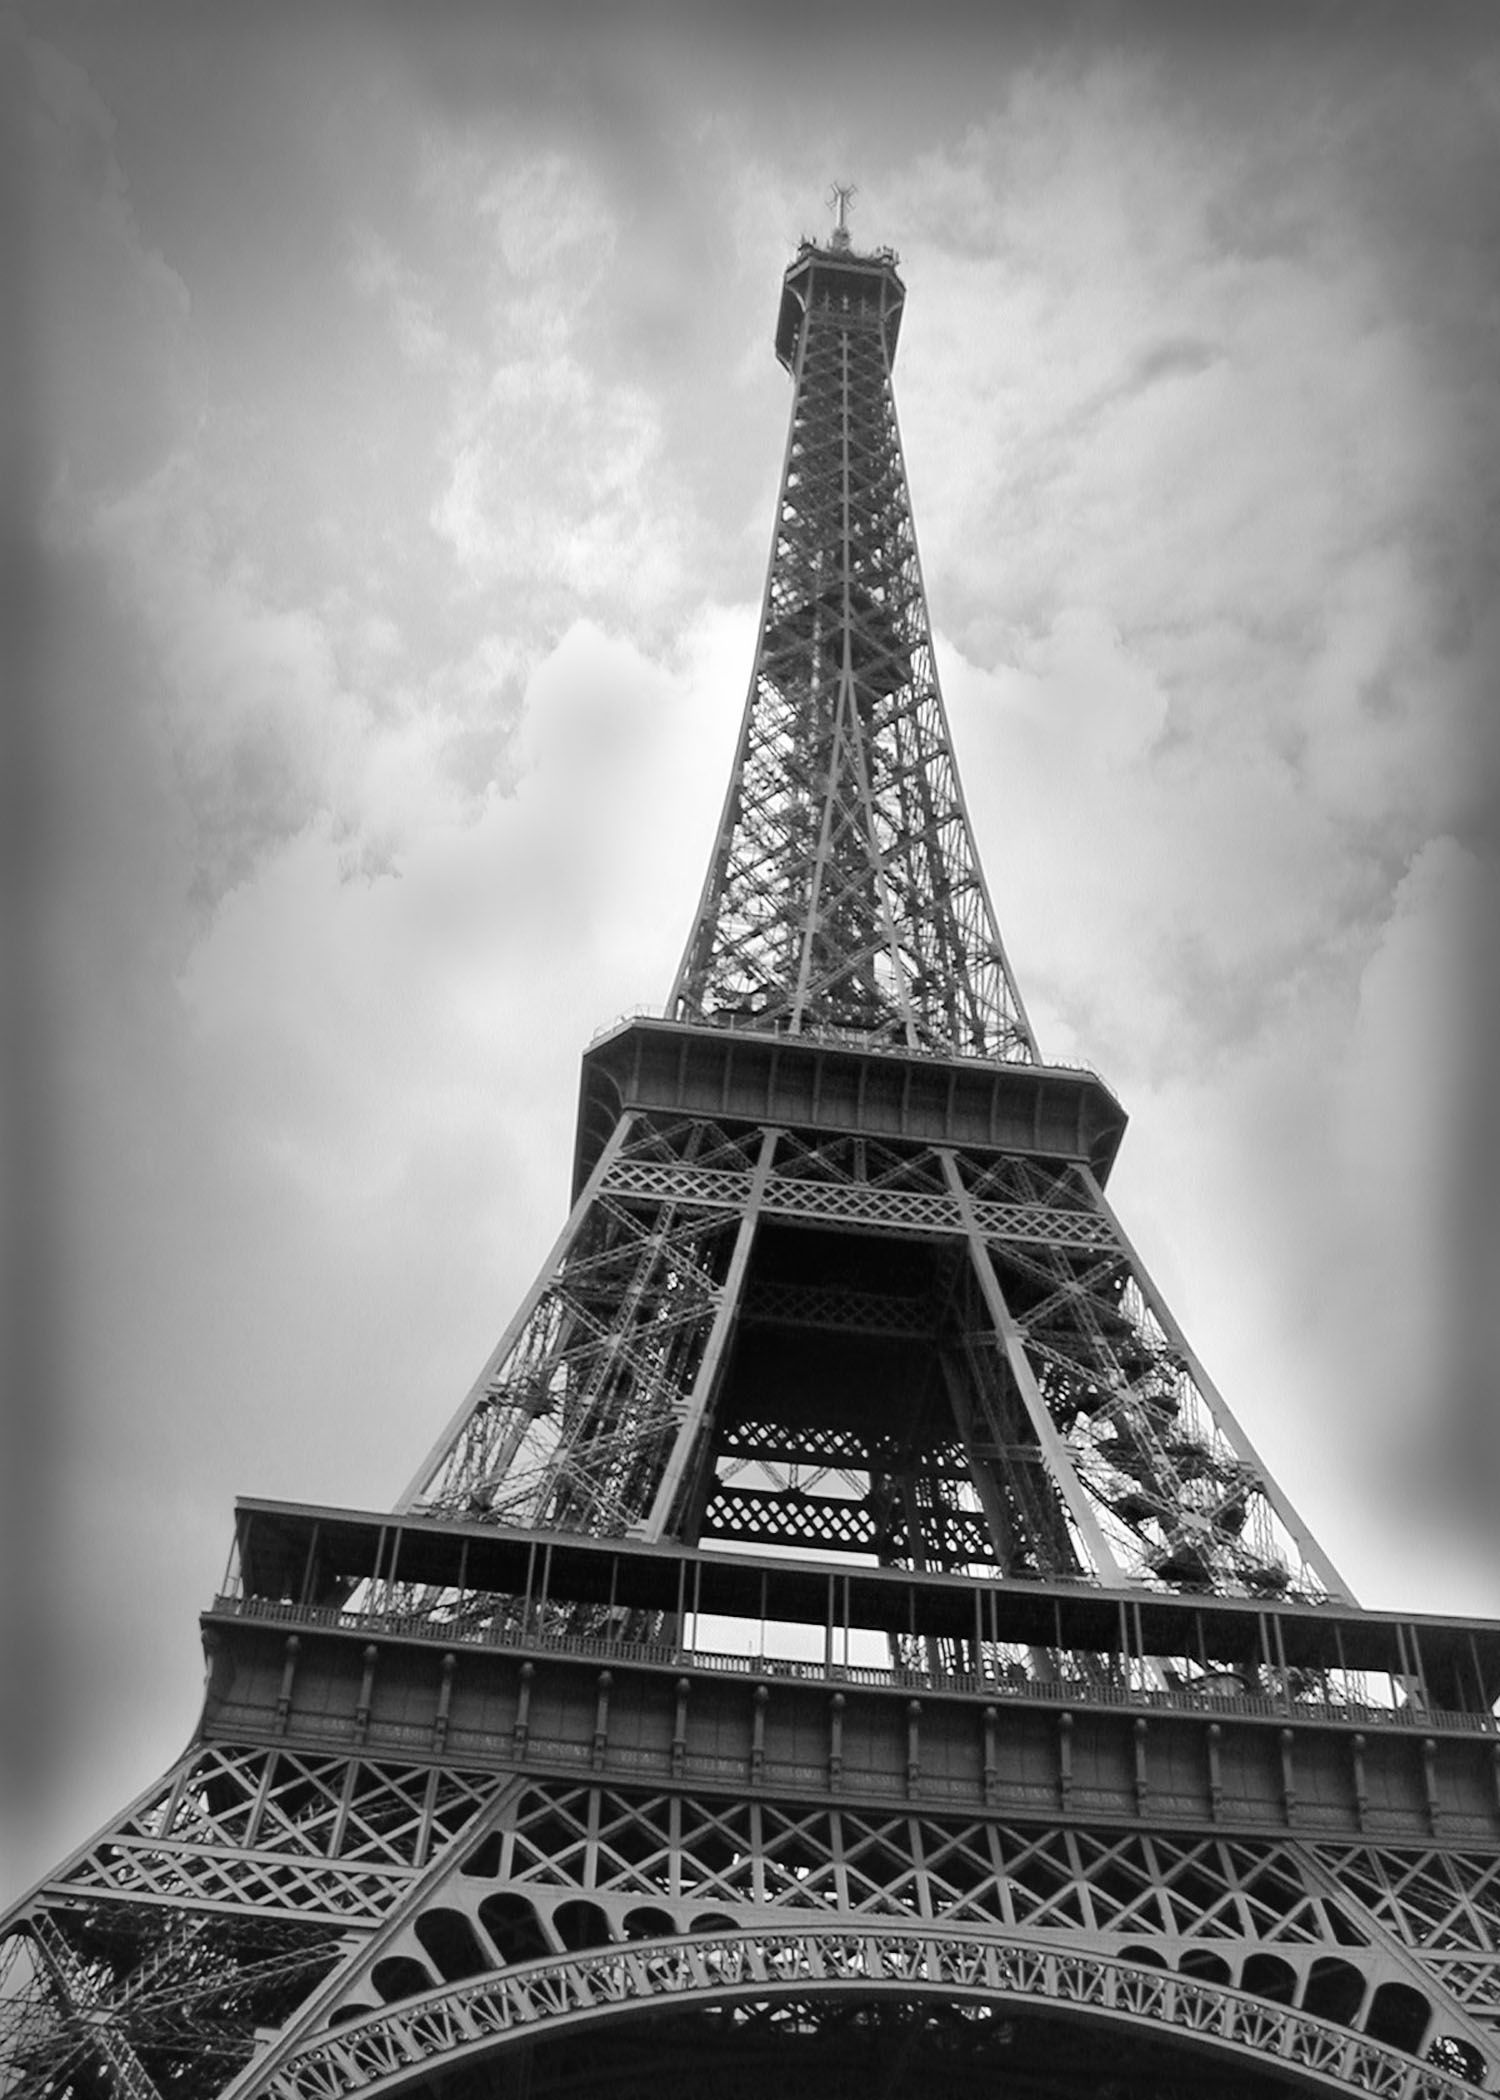 The Eiffel Tower Tour eiffel, Tower, Architecture